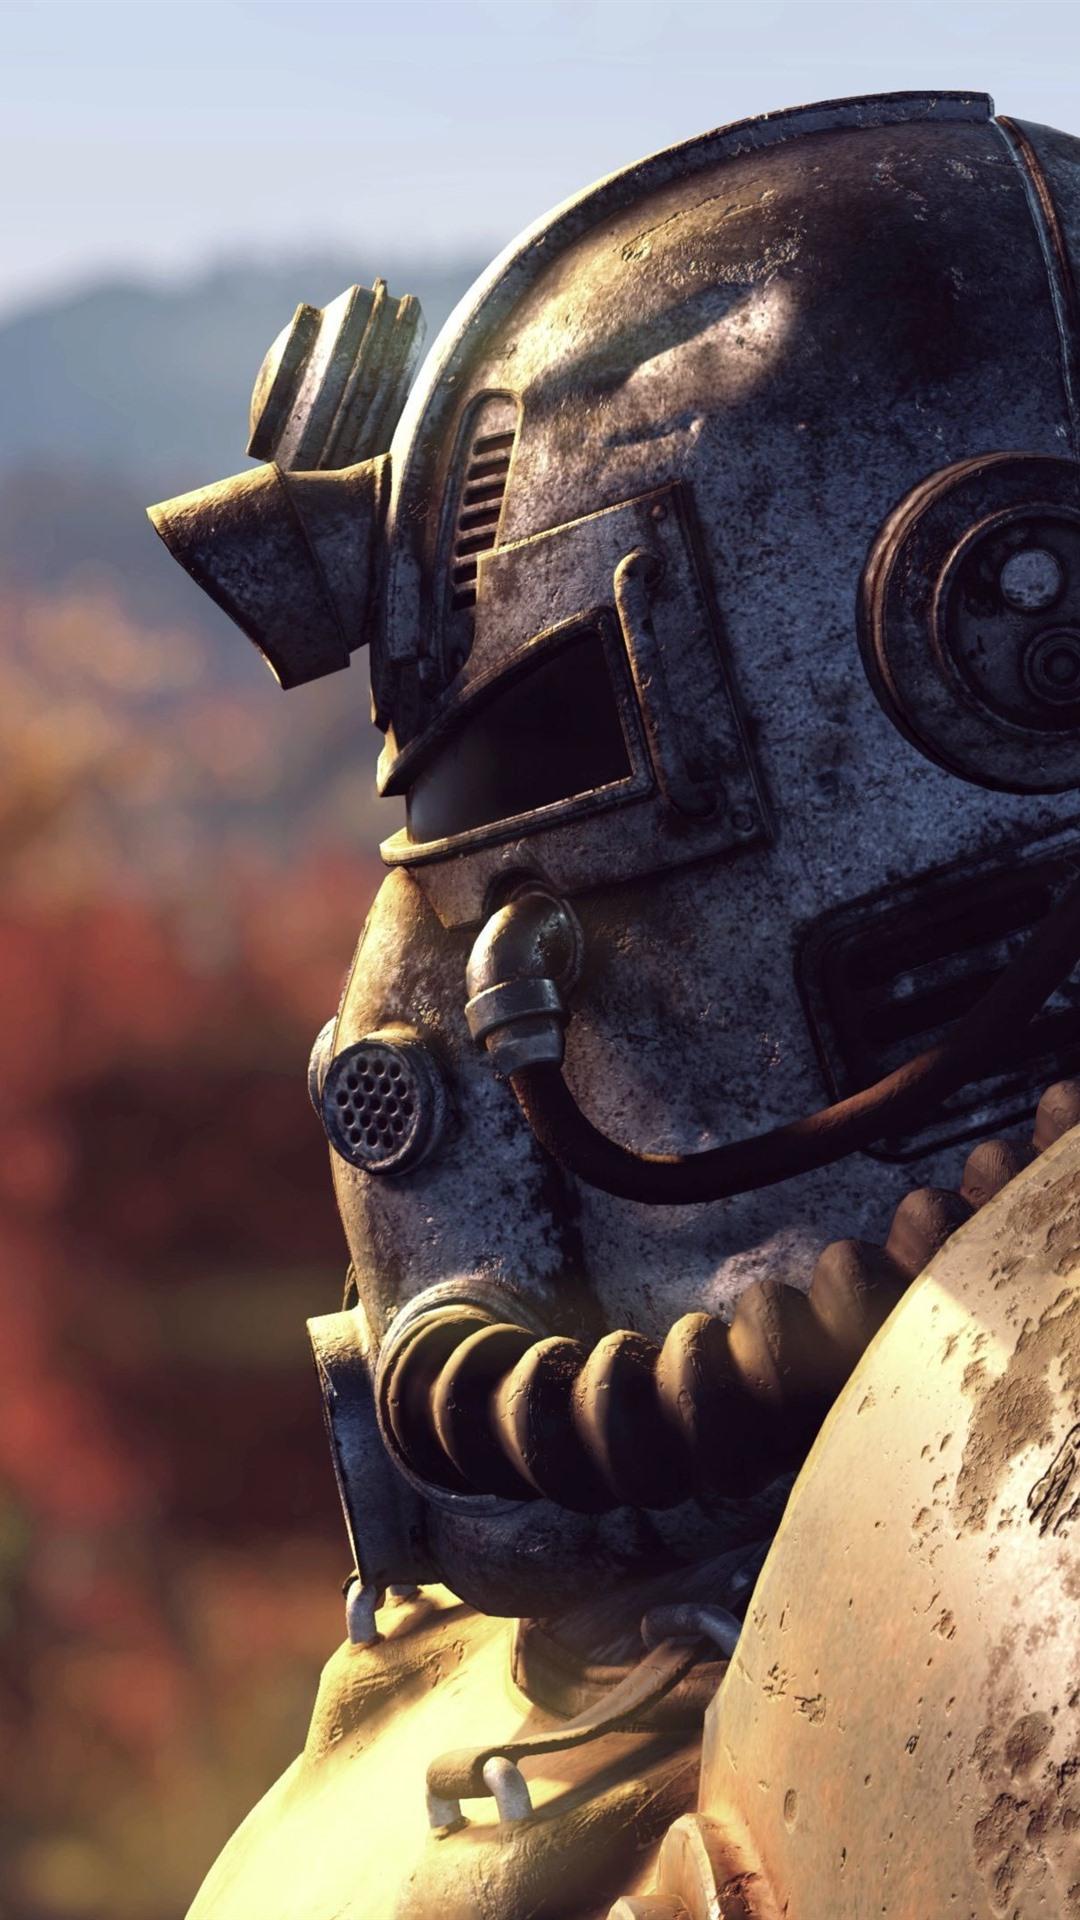 Fallout Warrior Helmet 1080x1920 Iphone 8 7 6 6s Plus